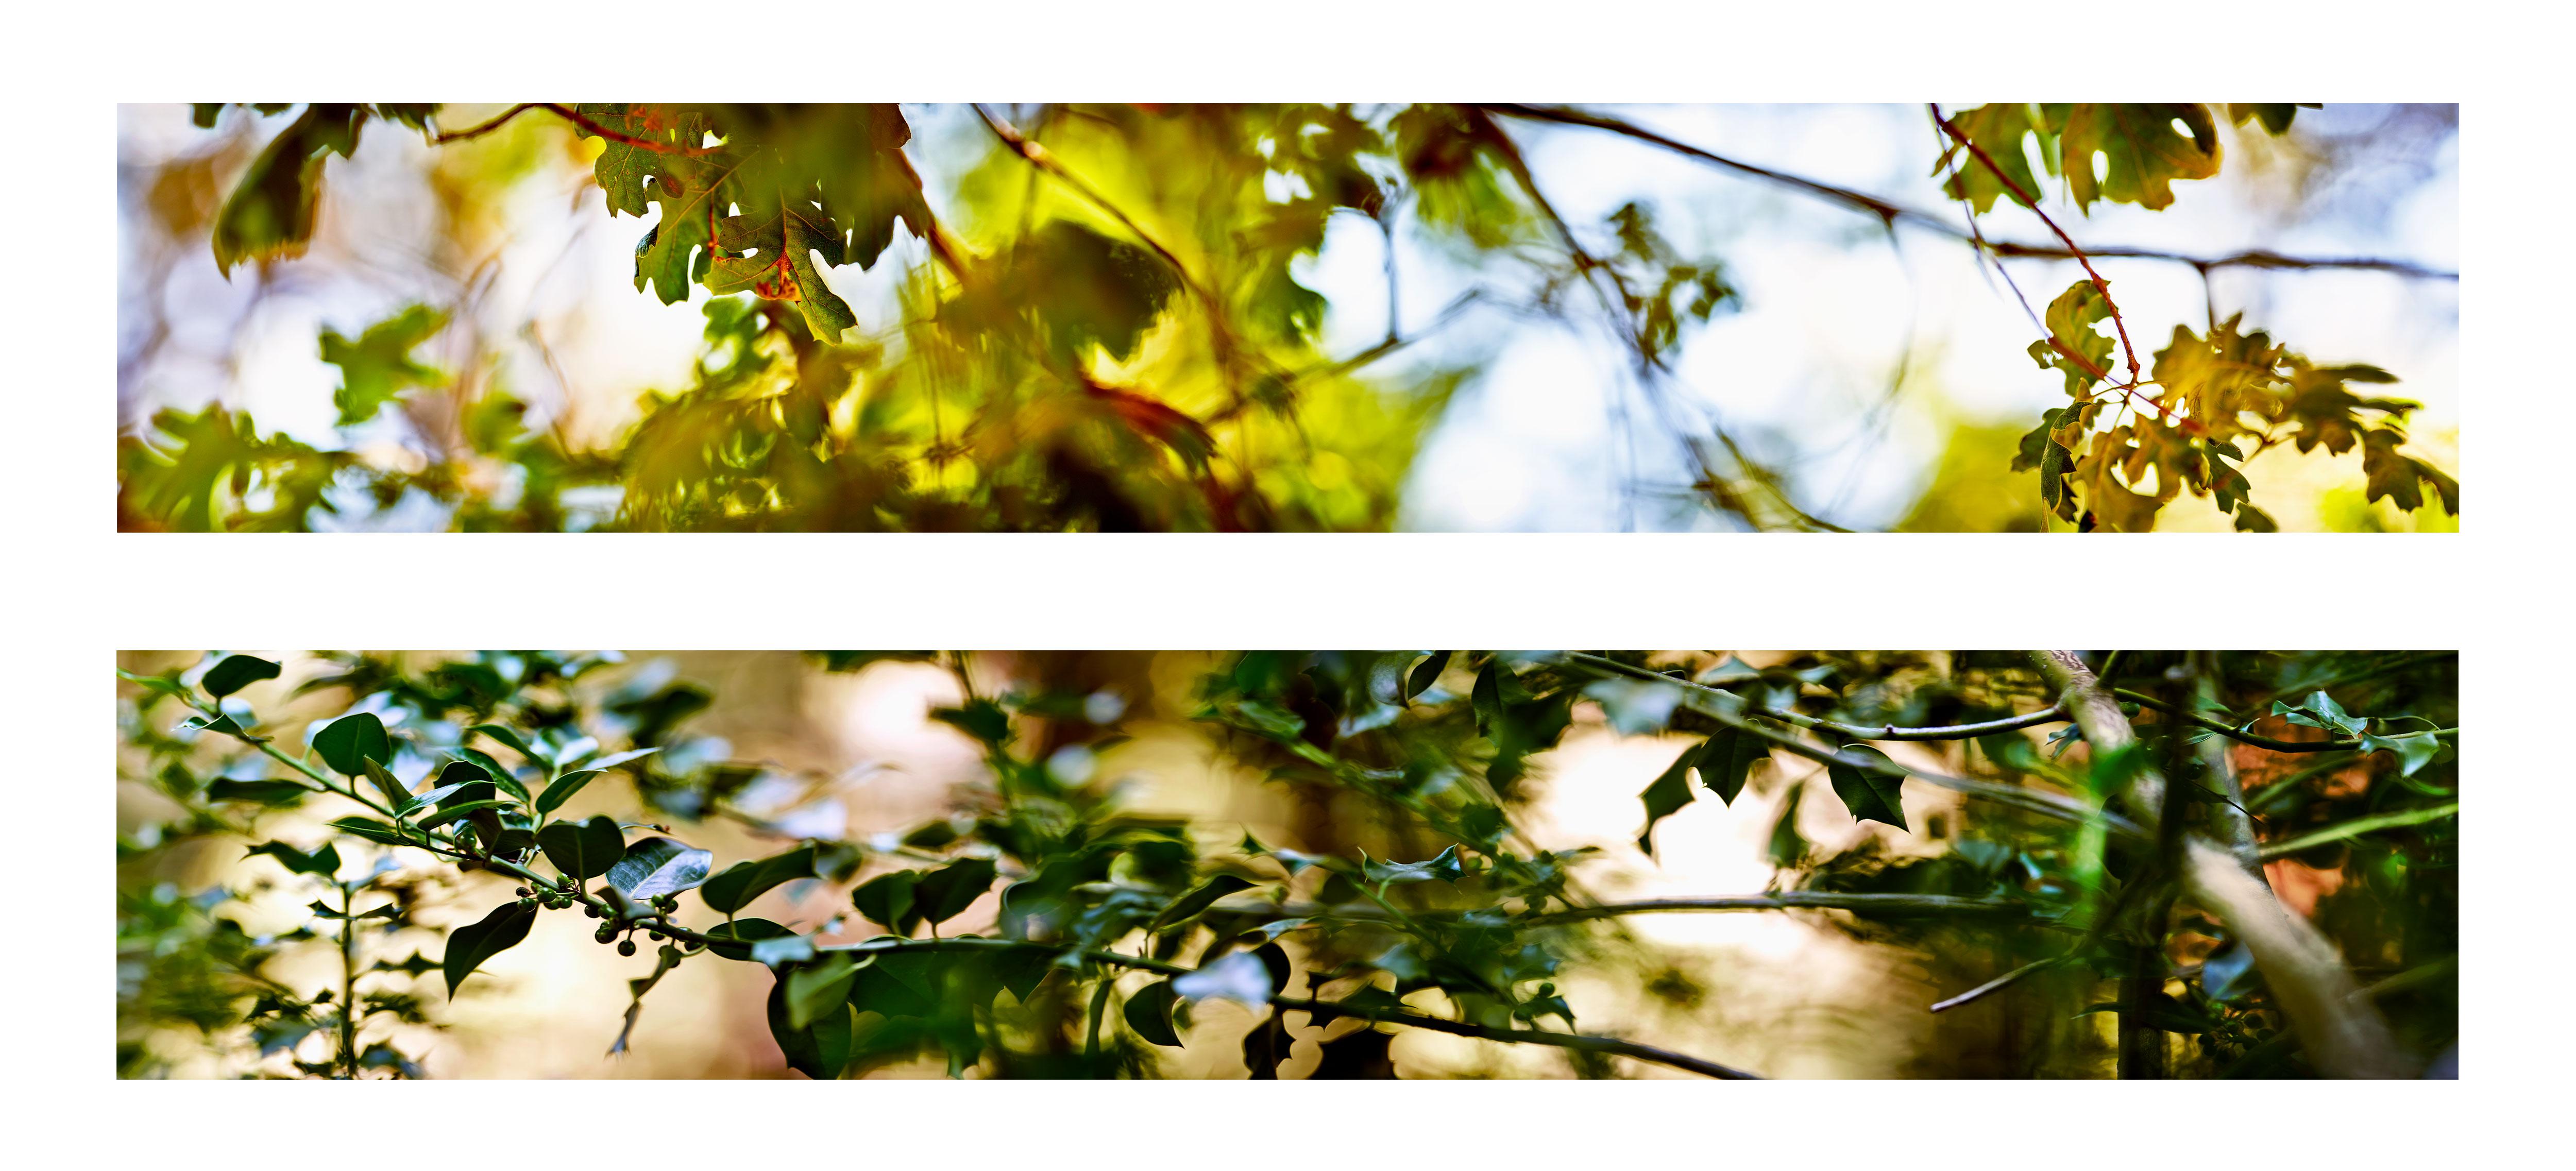 Ken Marchionno 2018 Crestline Oak and Crestline Holly / Archival ultrachrome print each 2' x 10'